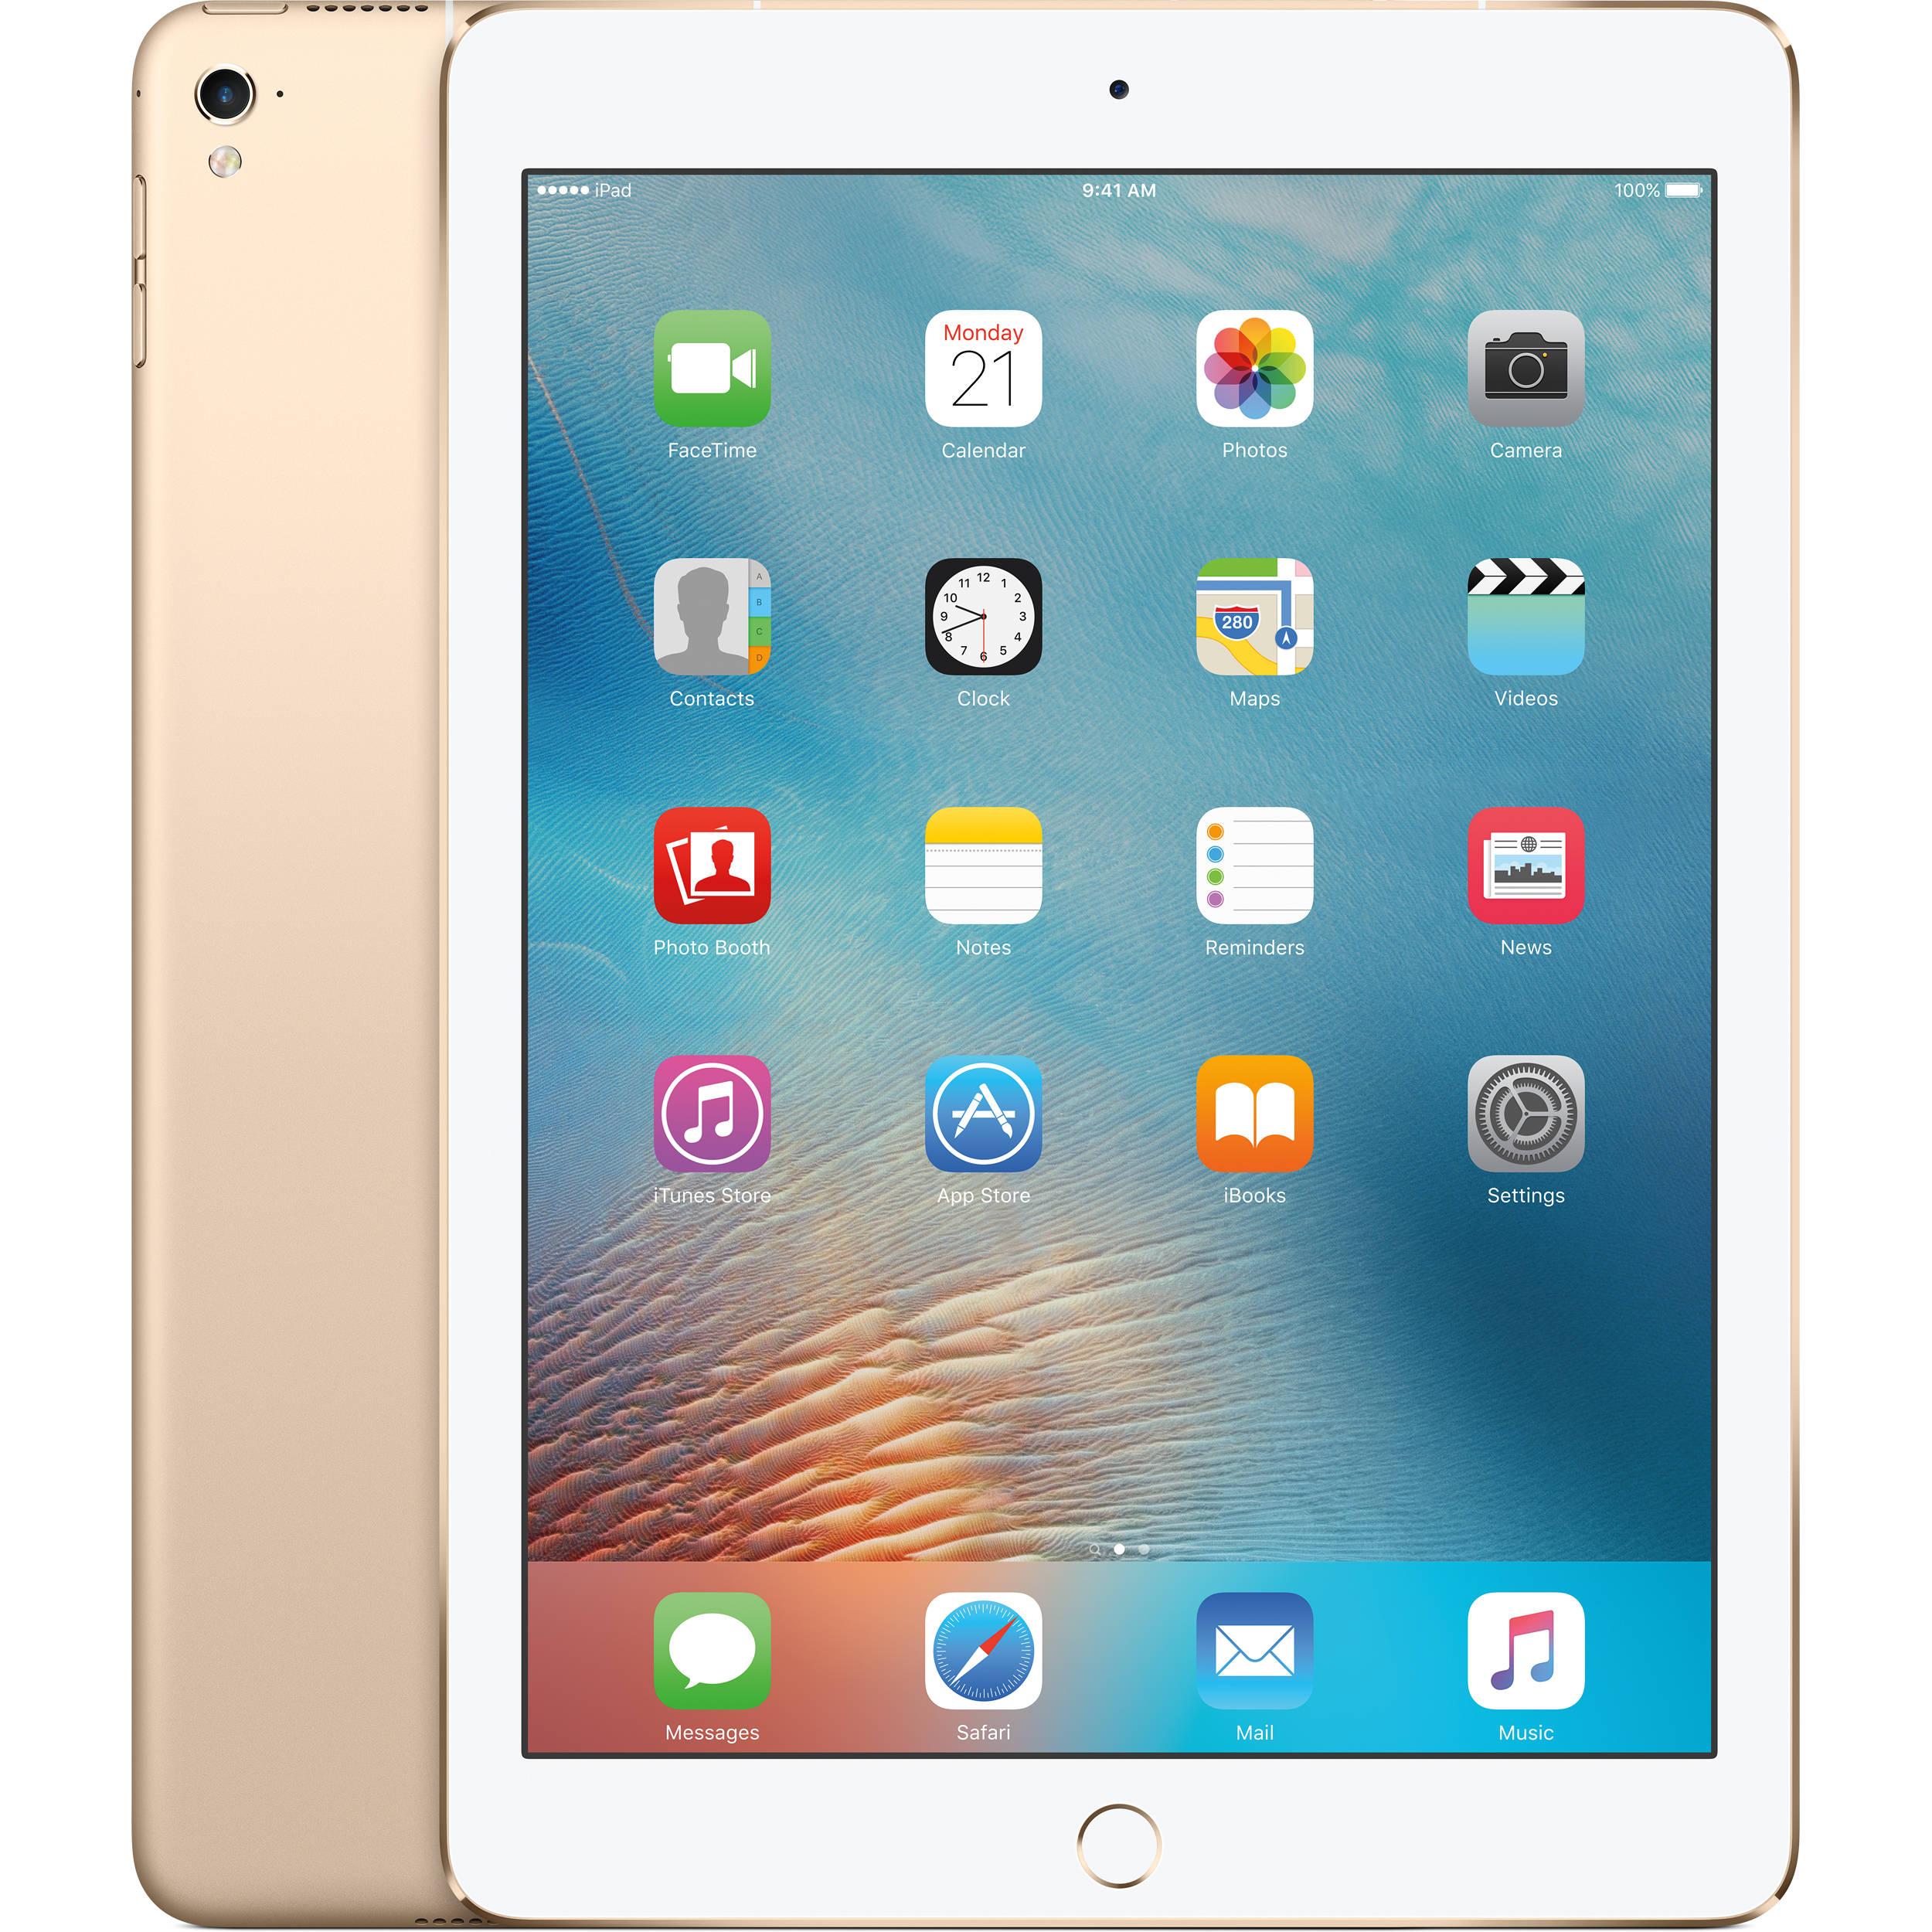 "Apple iPad Pro, A9X, iOS, 9.7"", Wi-Fi, 256GB now just £549 @ John Lewis + 2 year guarantee included"